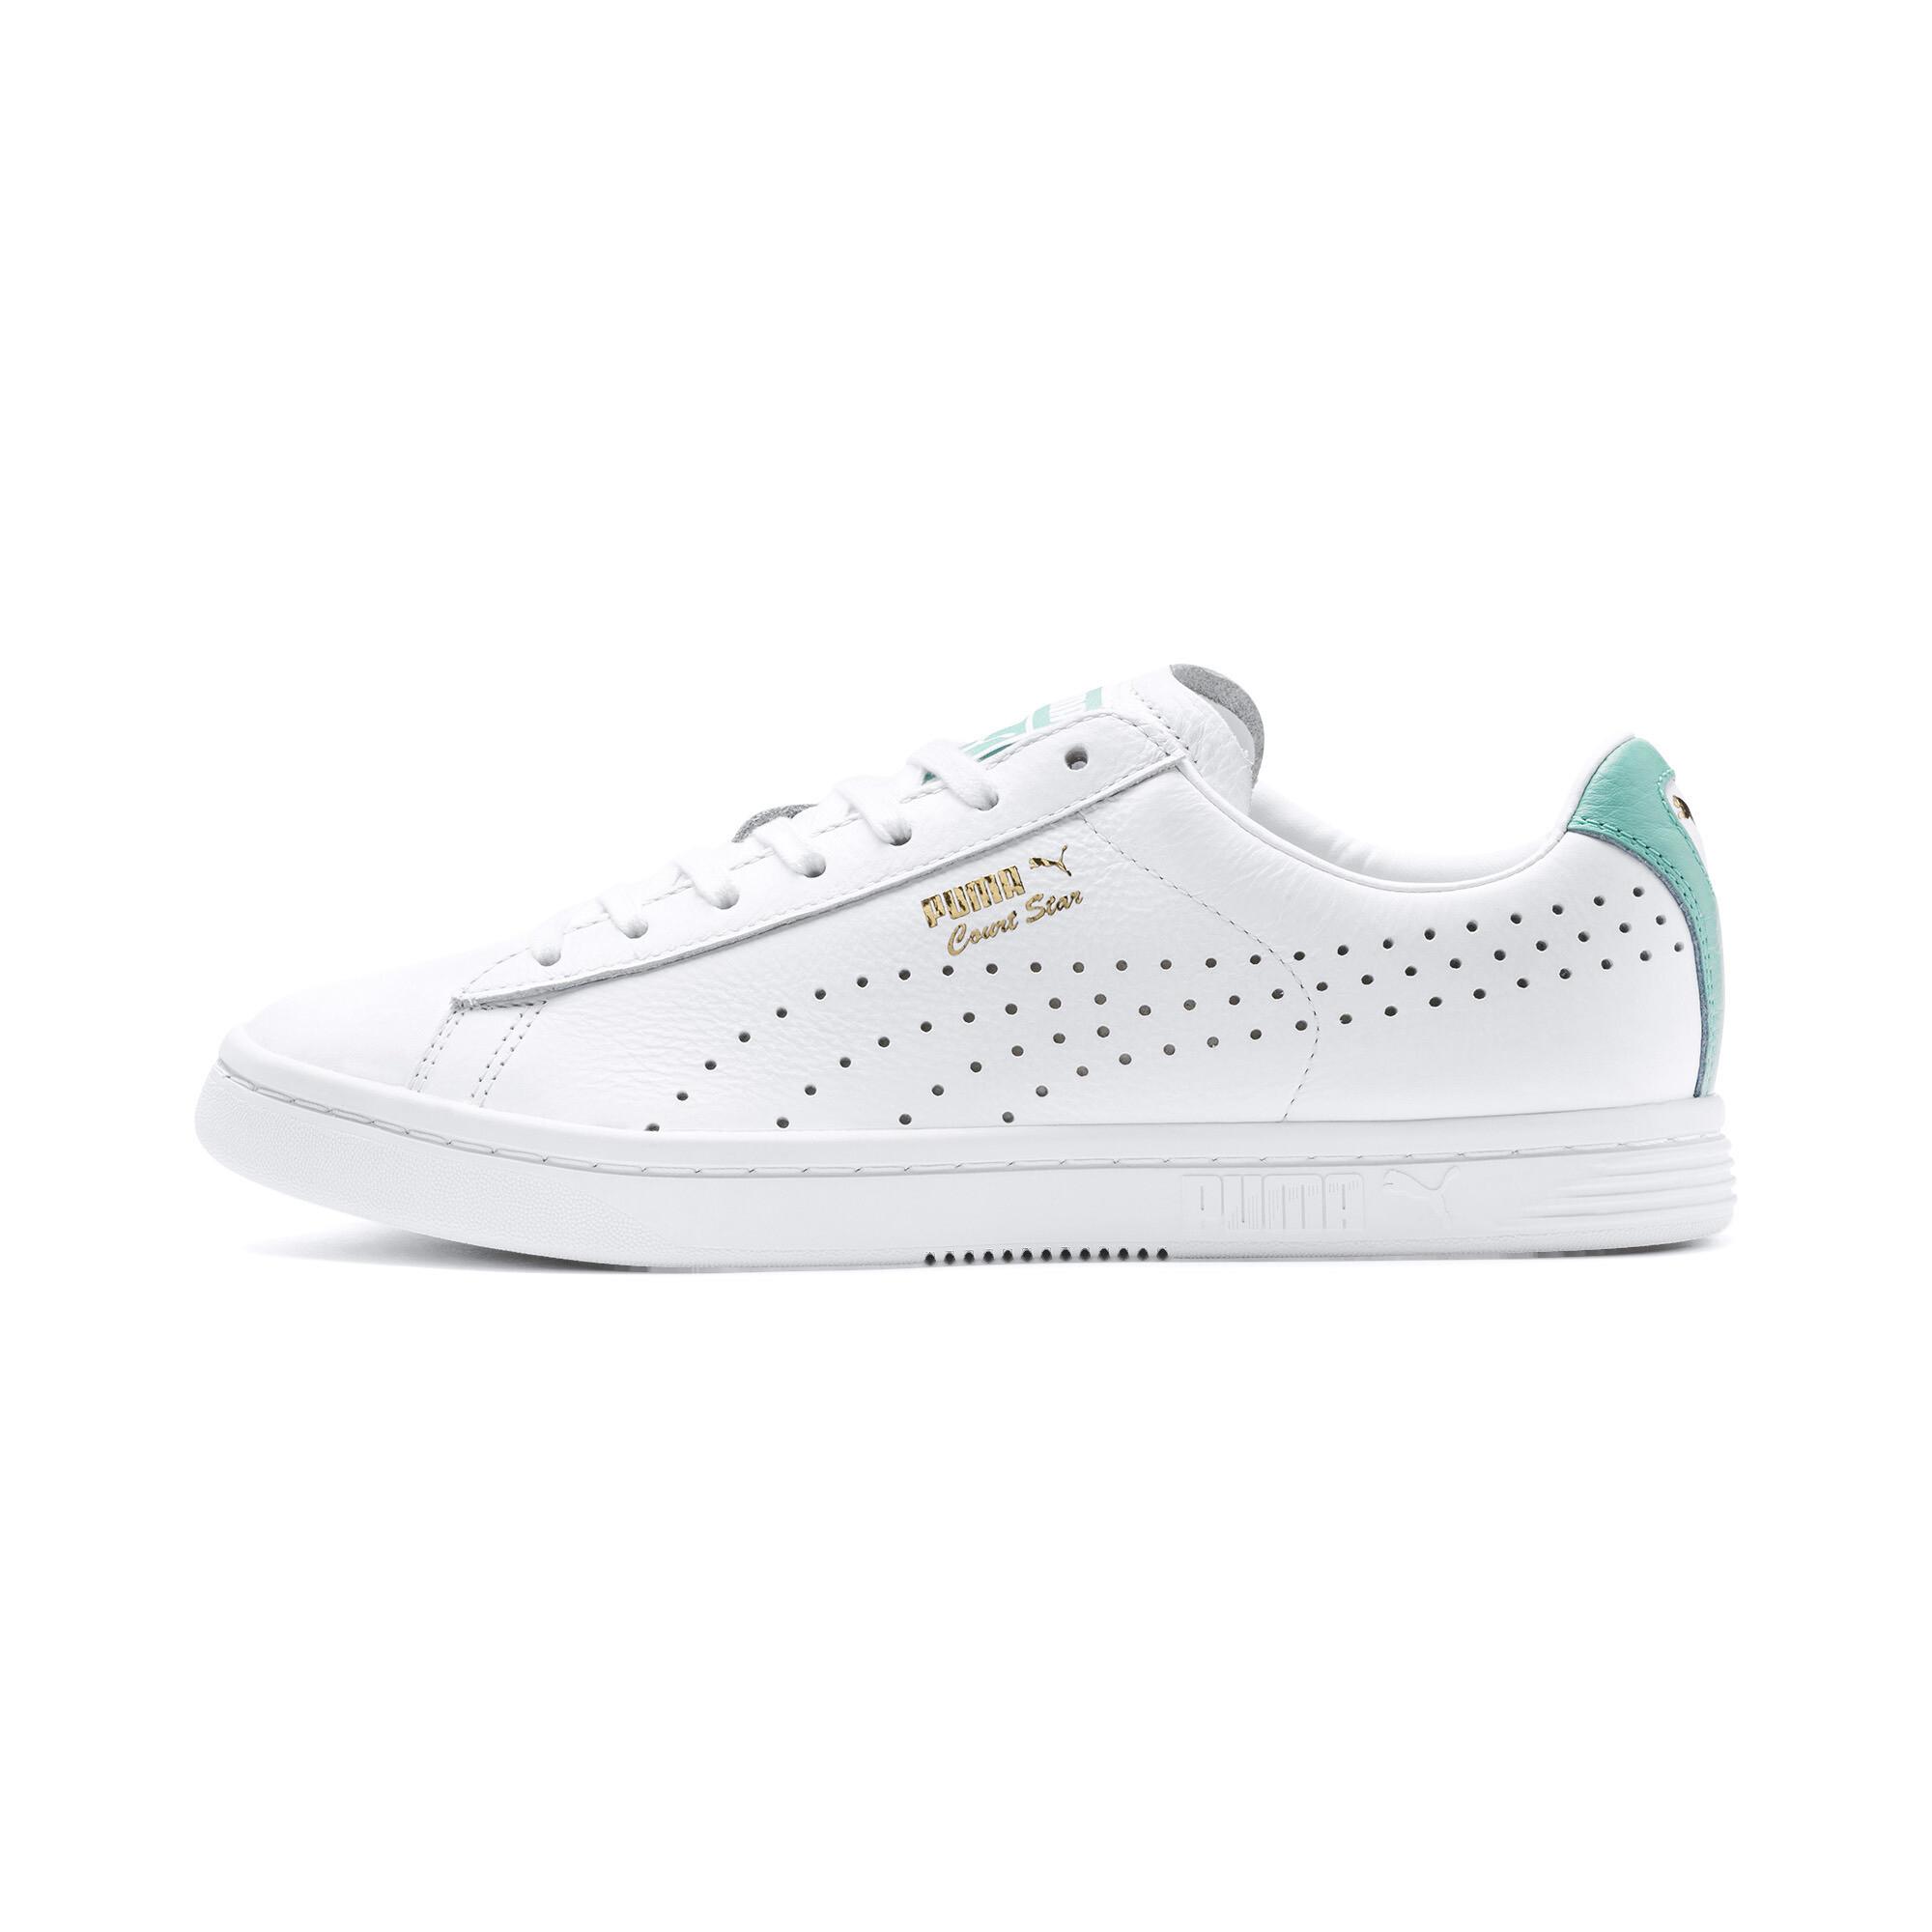 PUMA-Court-Star-Men-039-s-Sneakers-Unisex-Shoe-Sport-Classics thumbnail 4